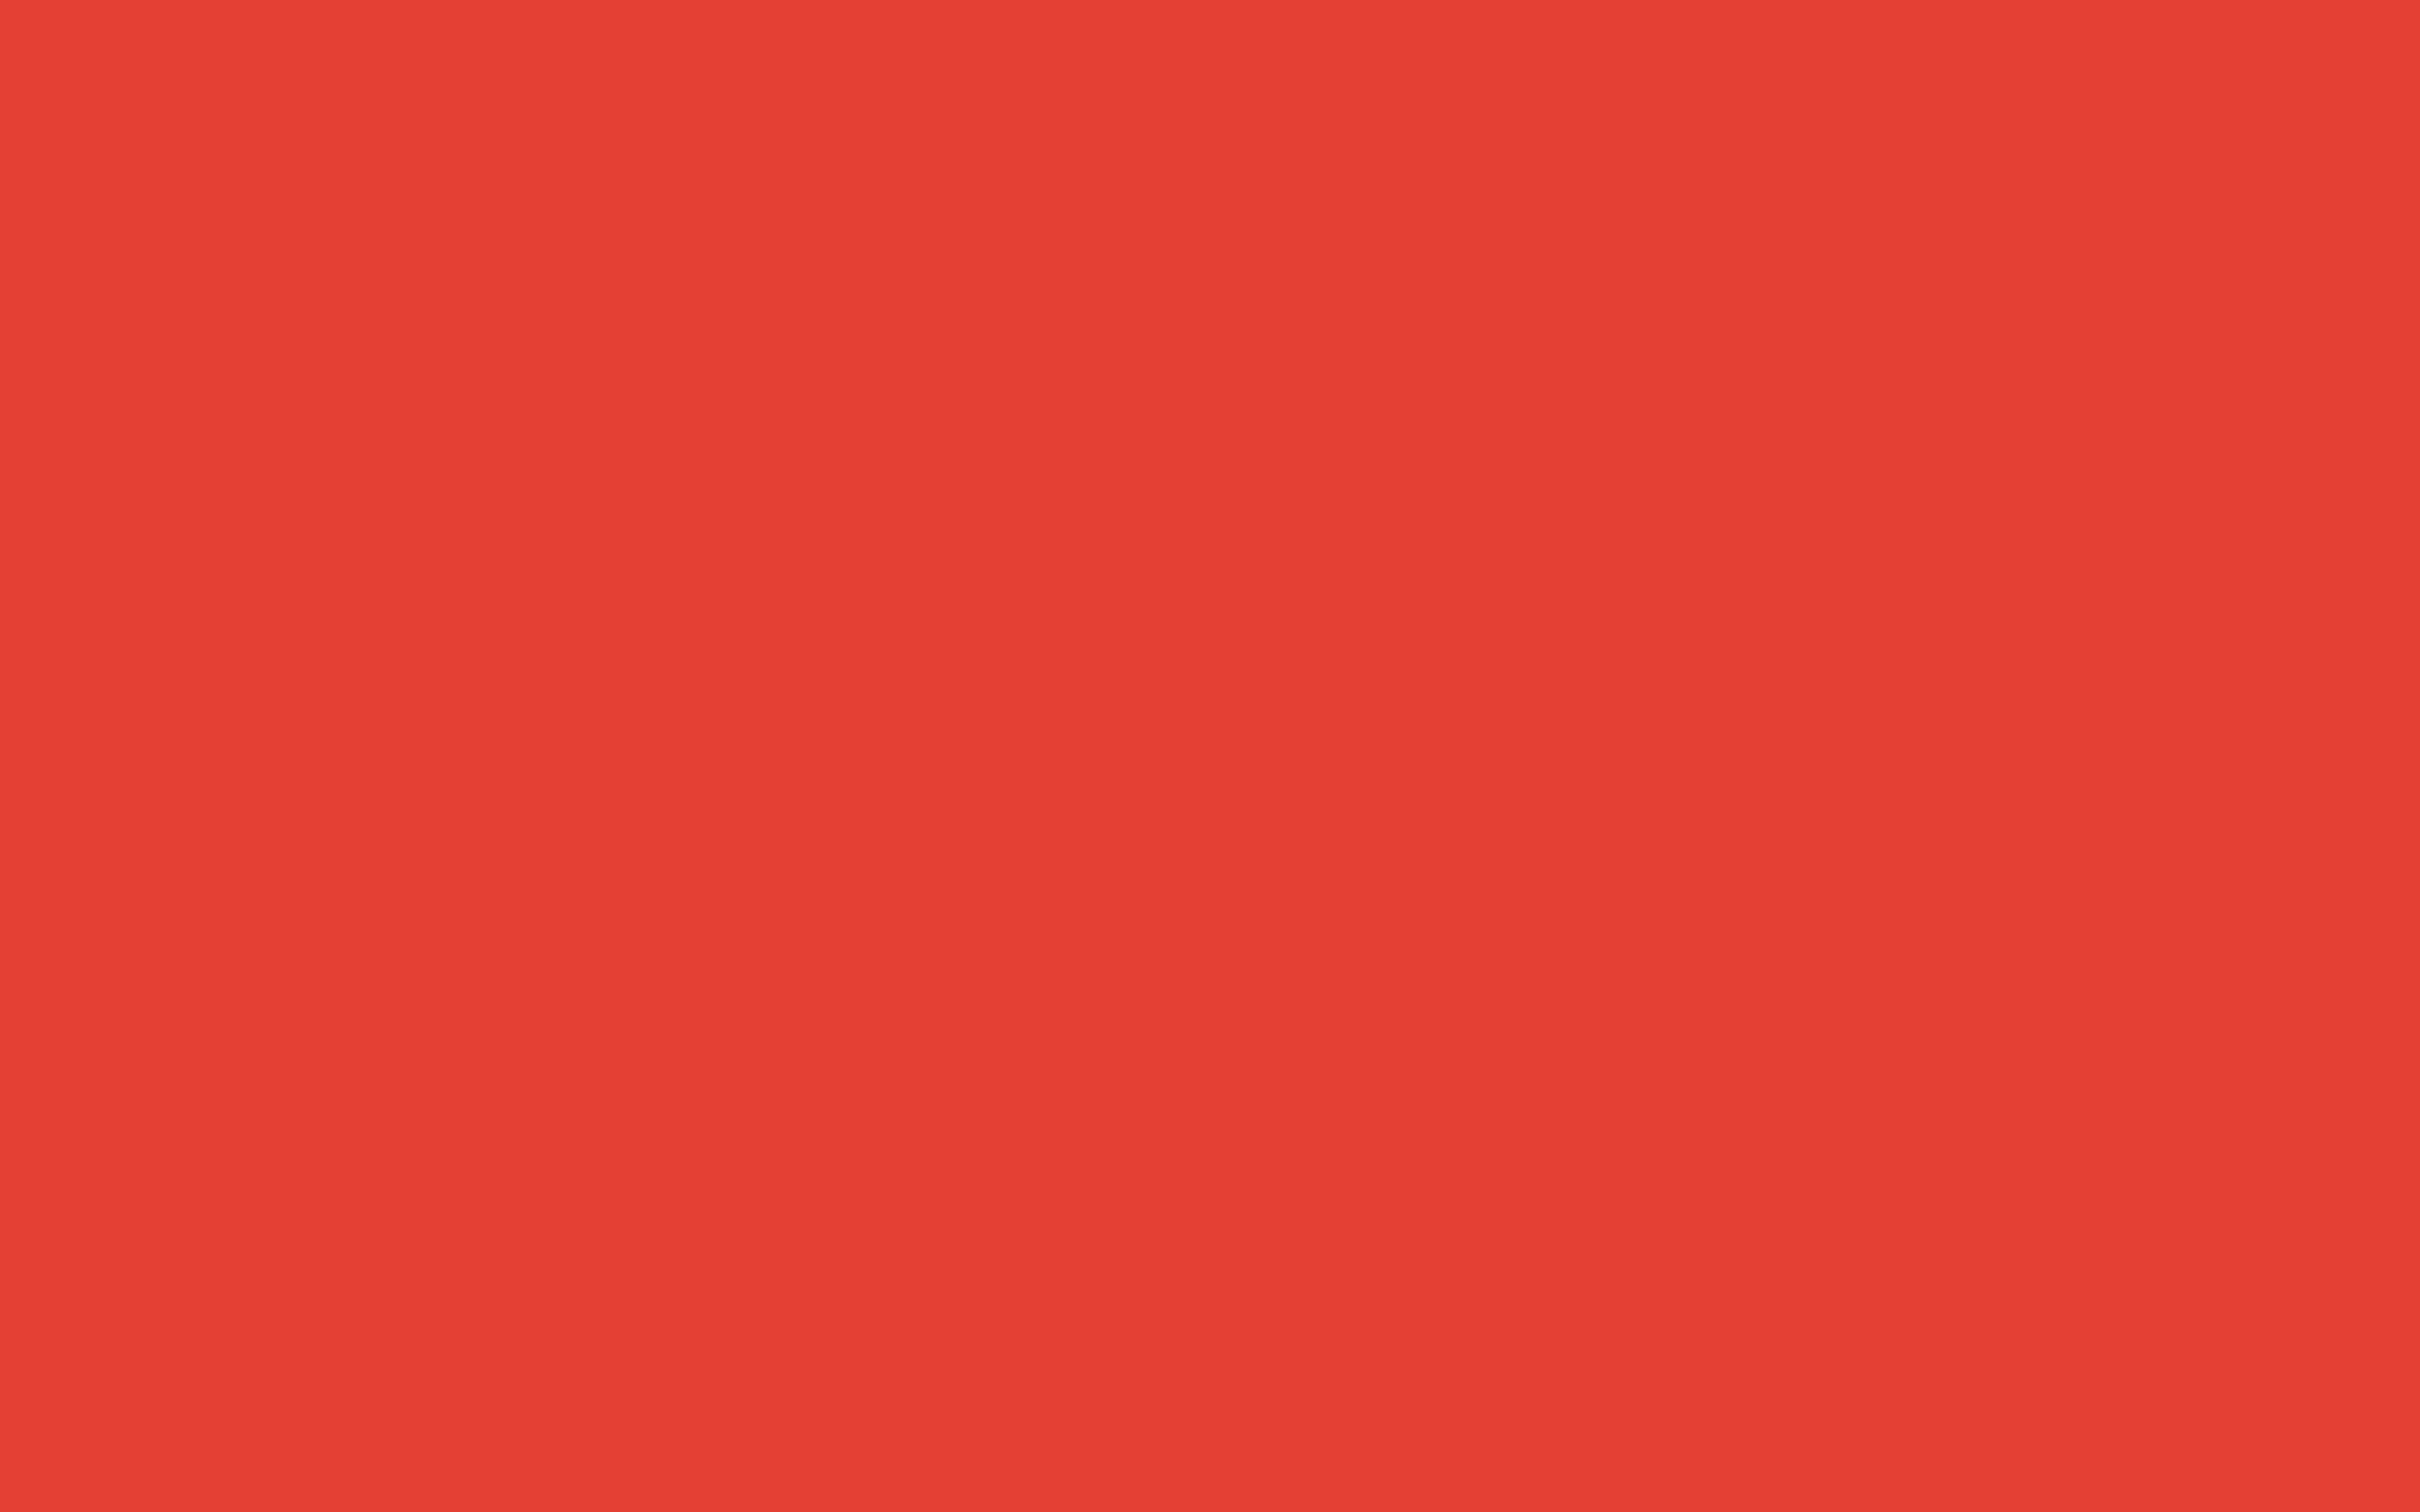 2560x1600 Vermilion Cinnabar Solid Color Background